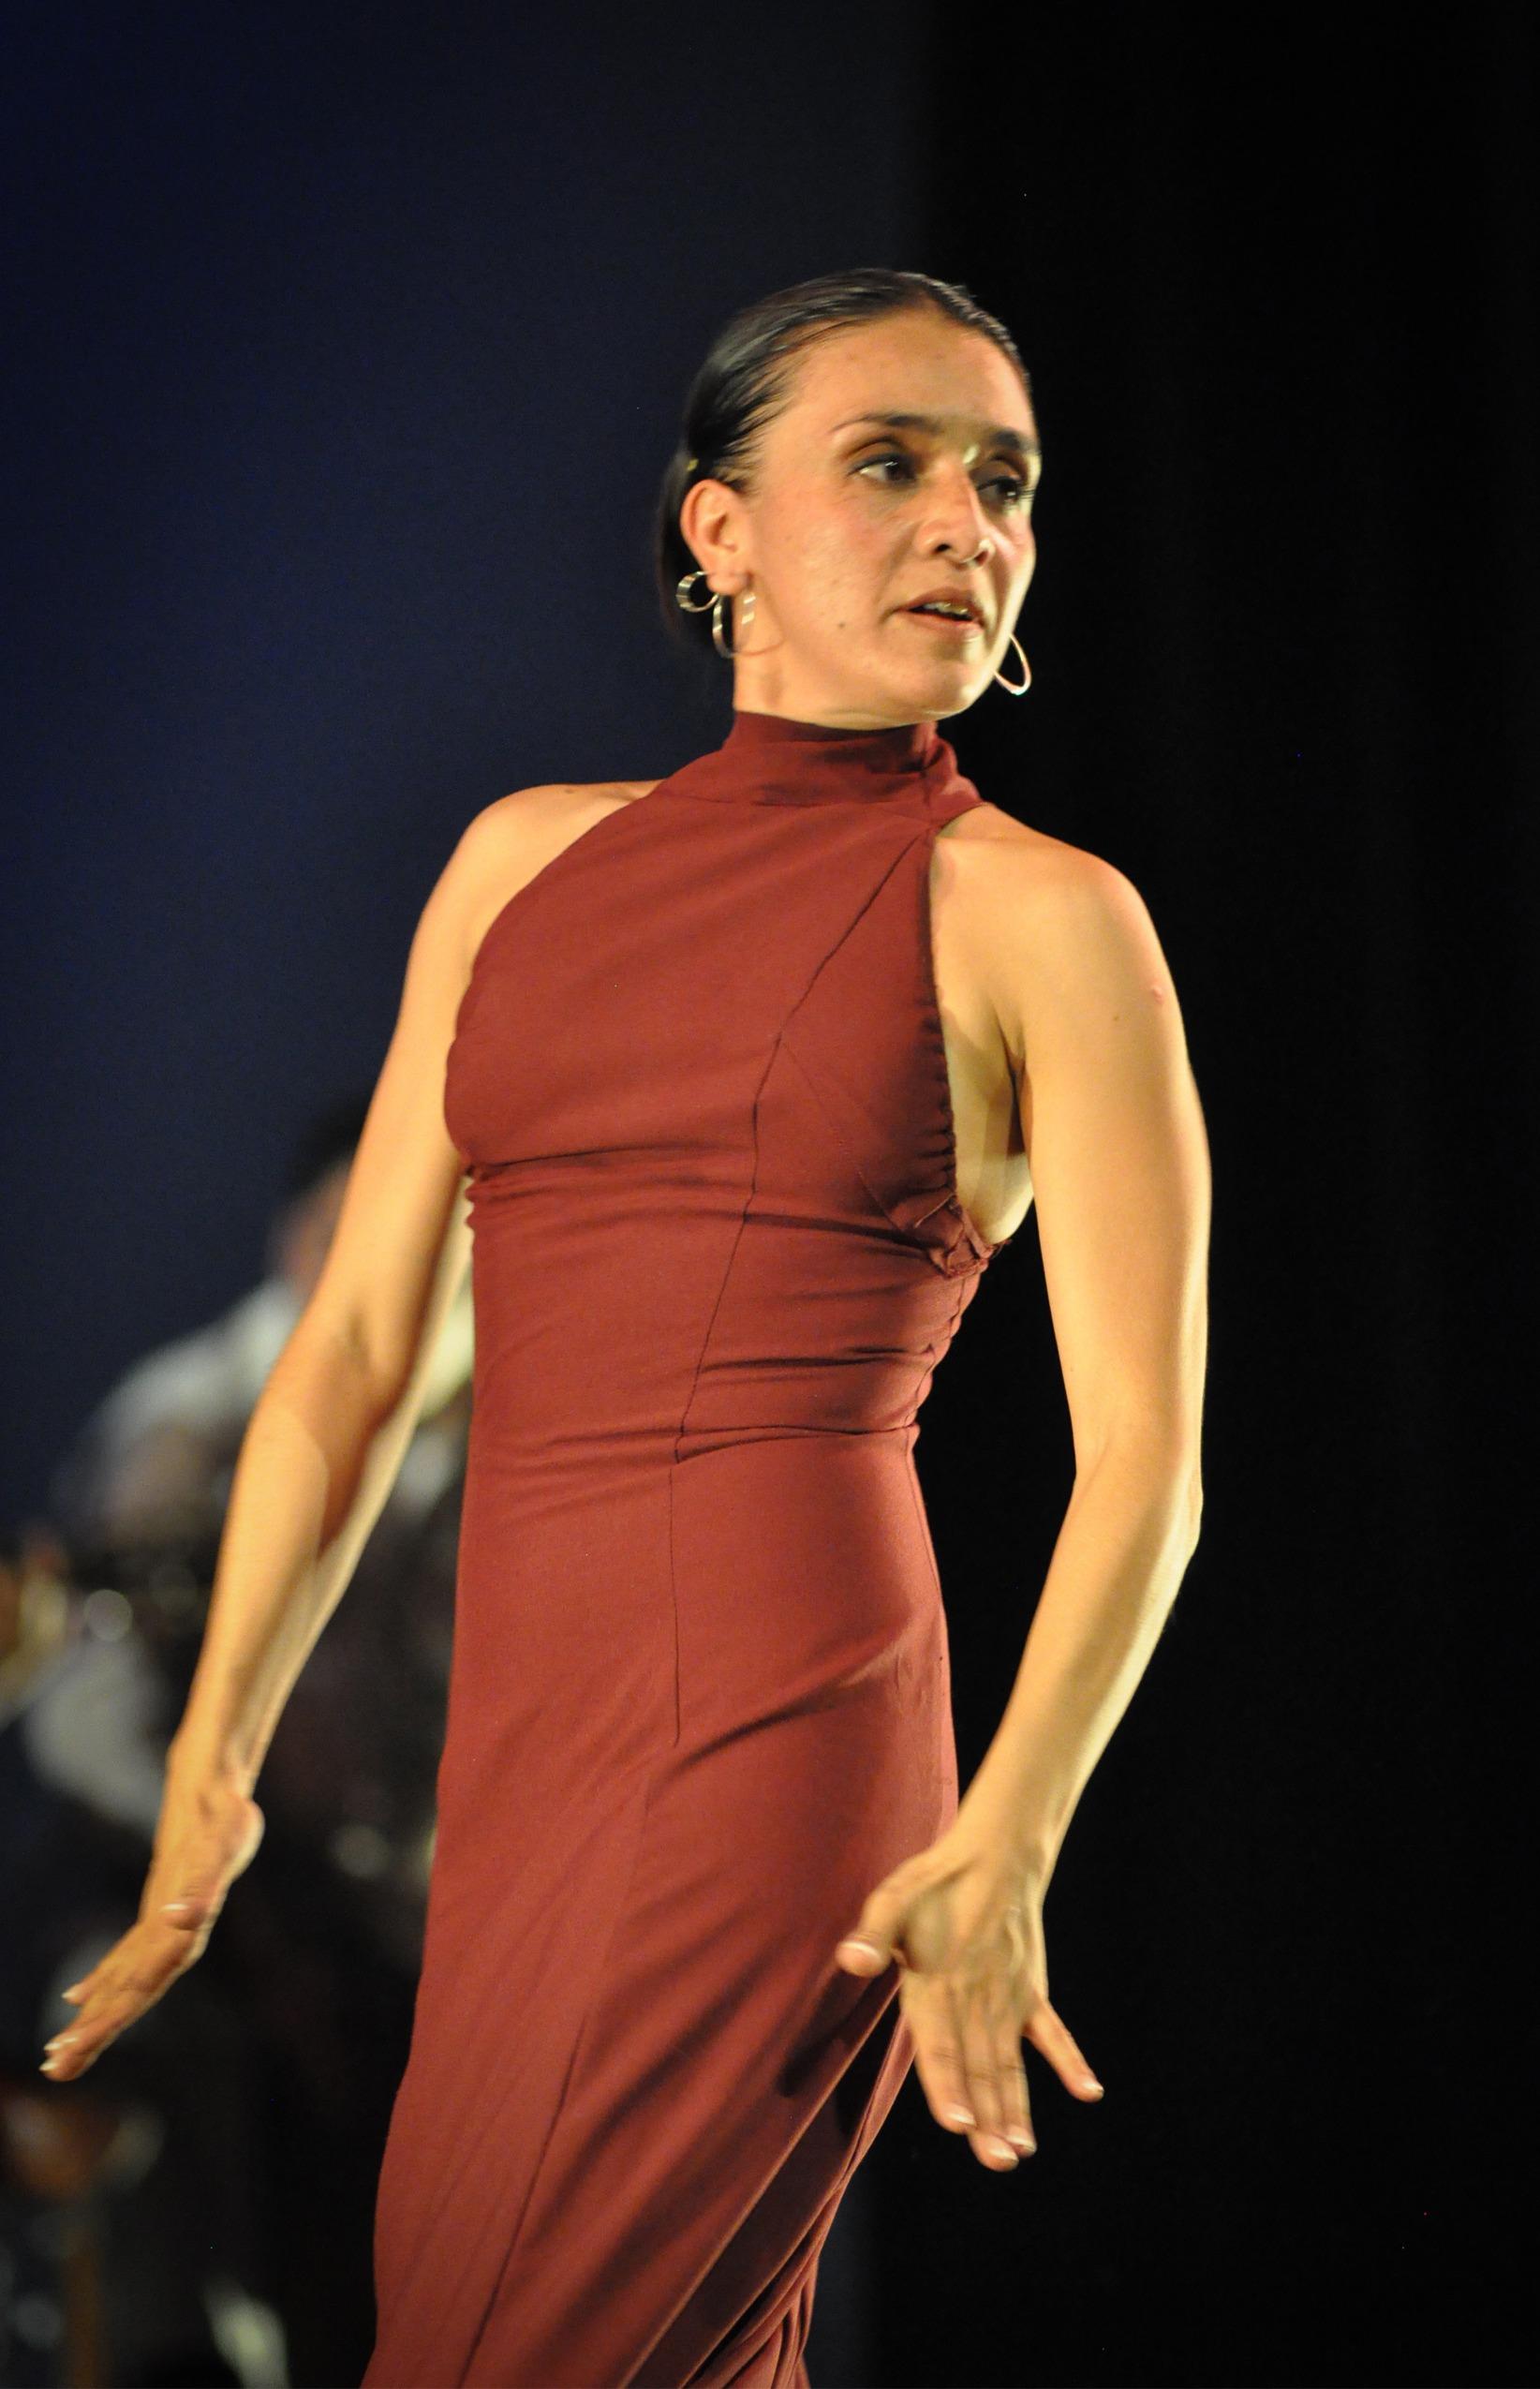 Lina Ravinesjpg